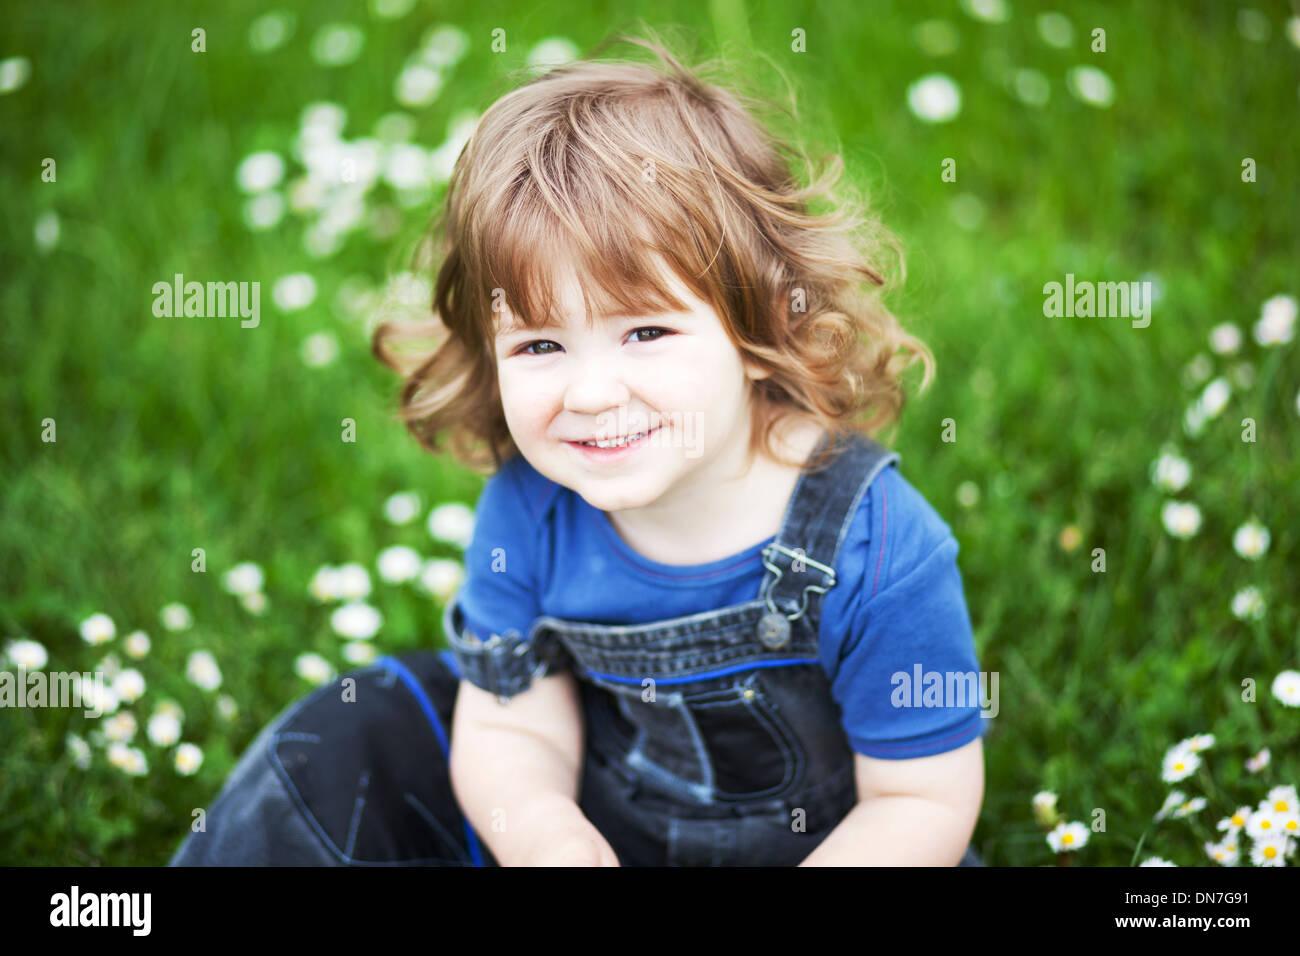 Portrait of a little smiling boy - Stock Image